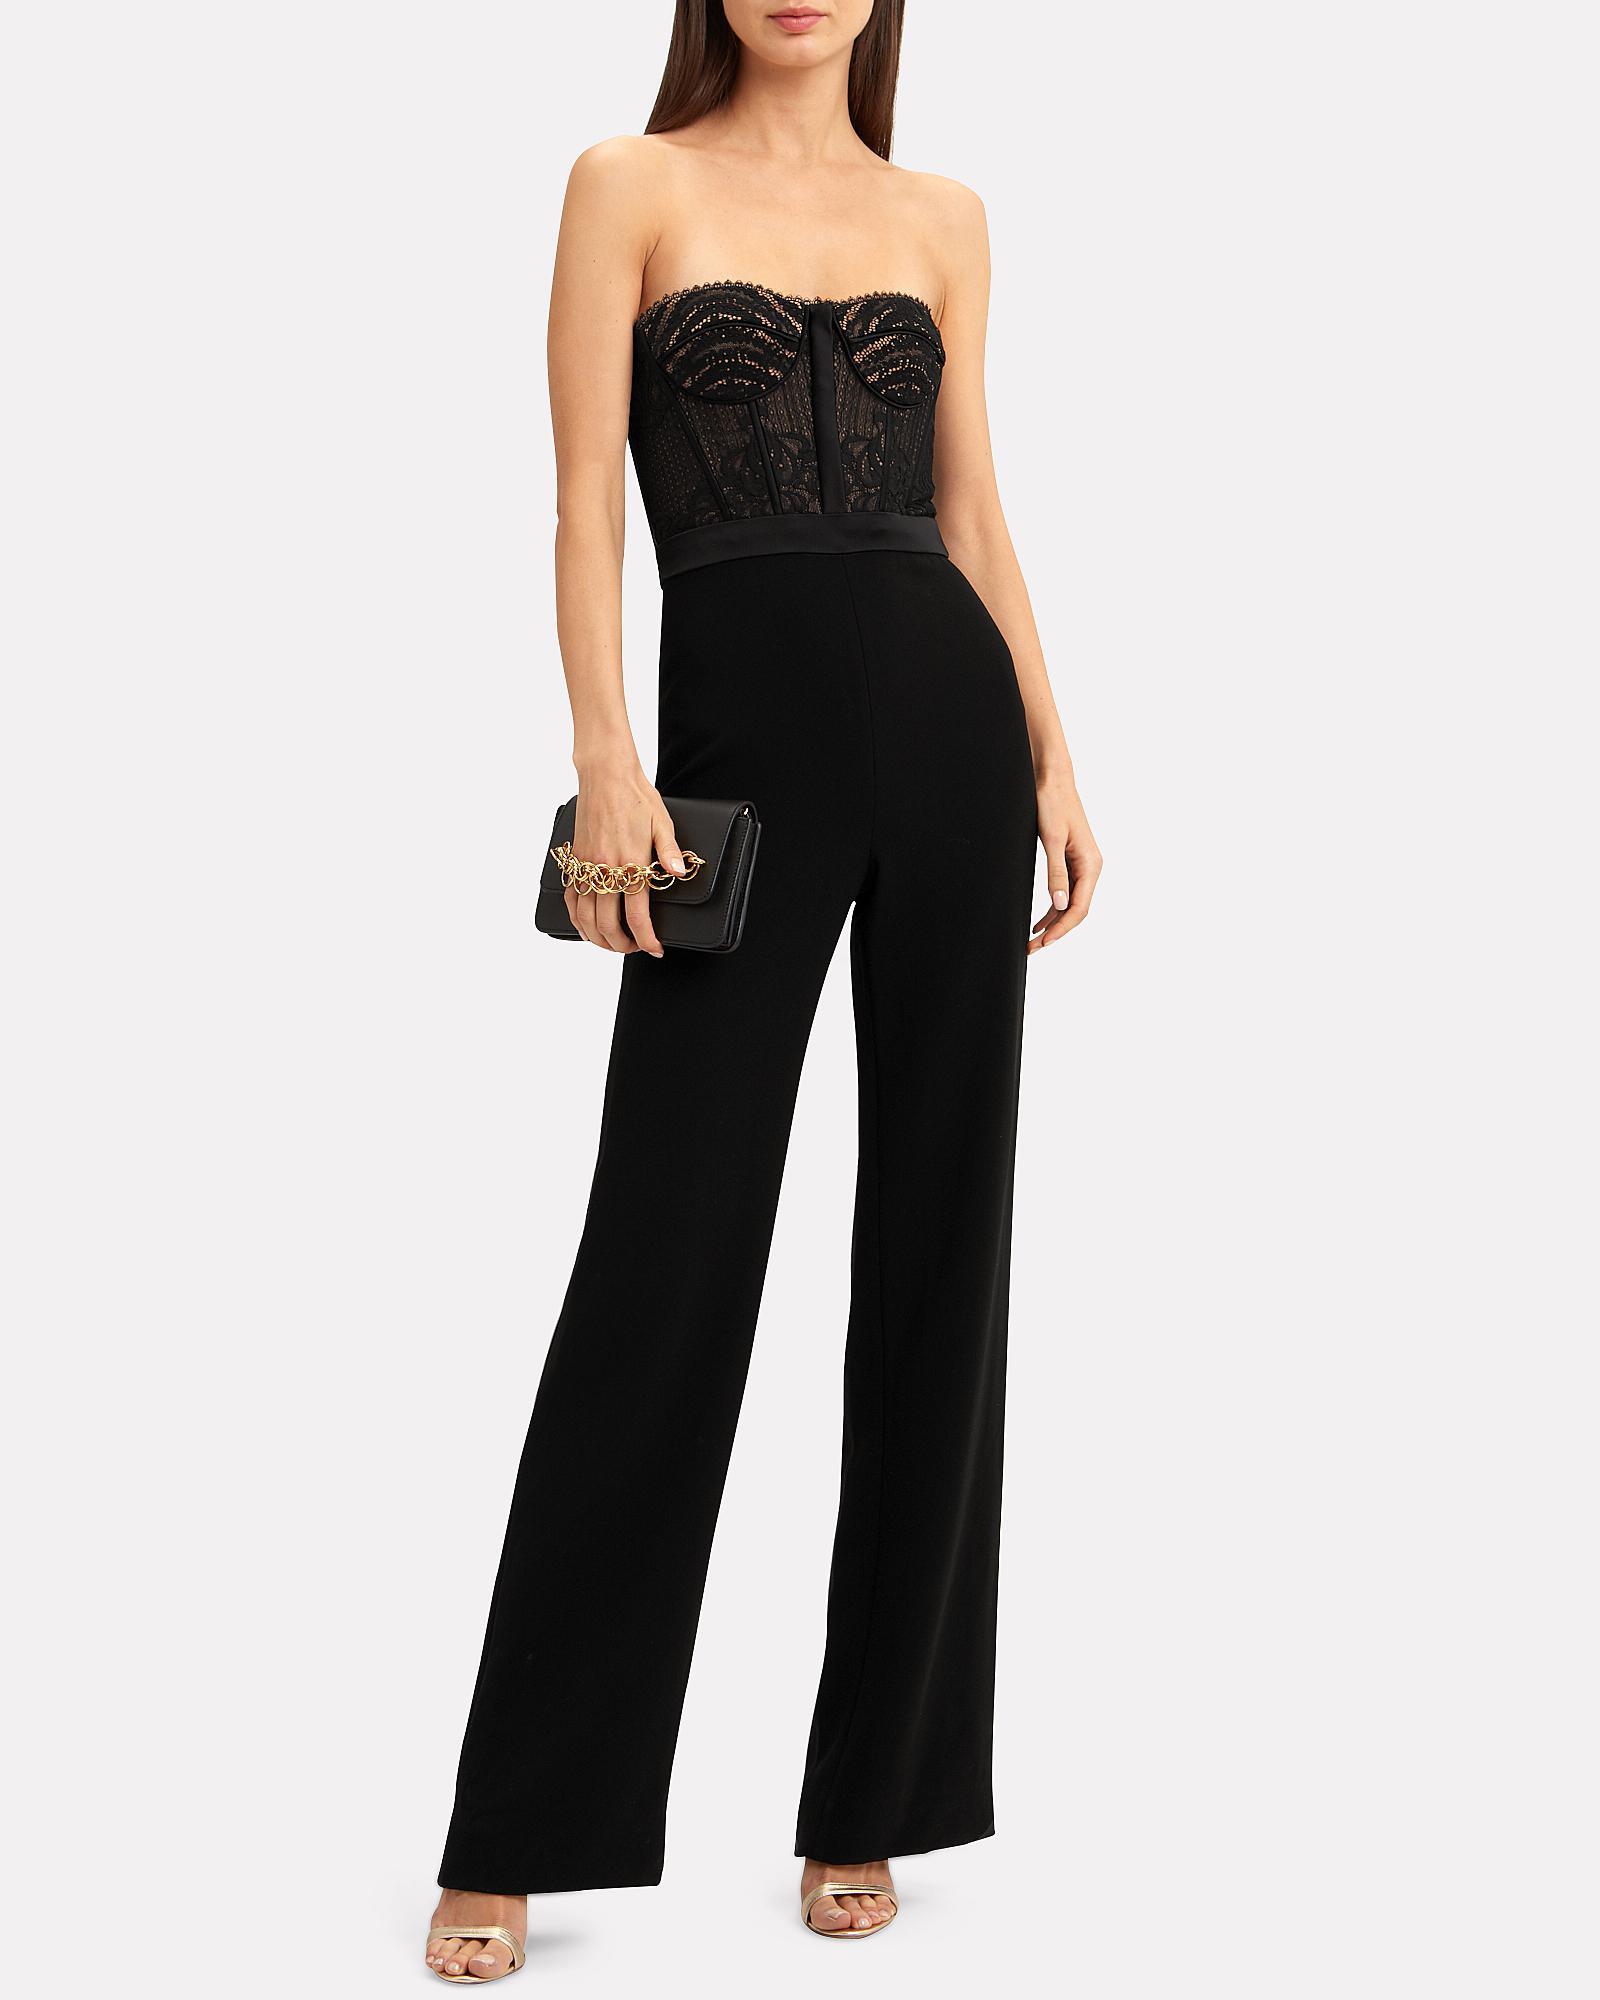 cc4eec770299 Jonathan Simkhai - Black Bustier Lace Jumpsuit - Lyst. View fullscreen